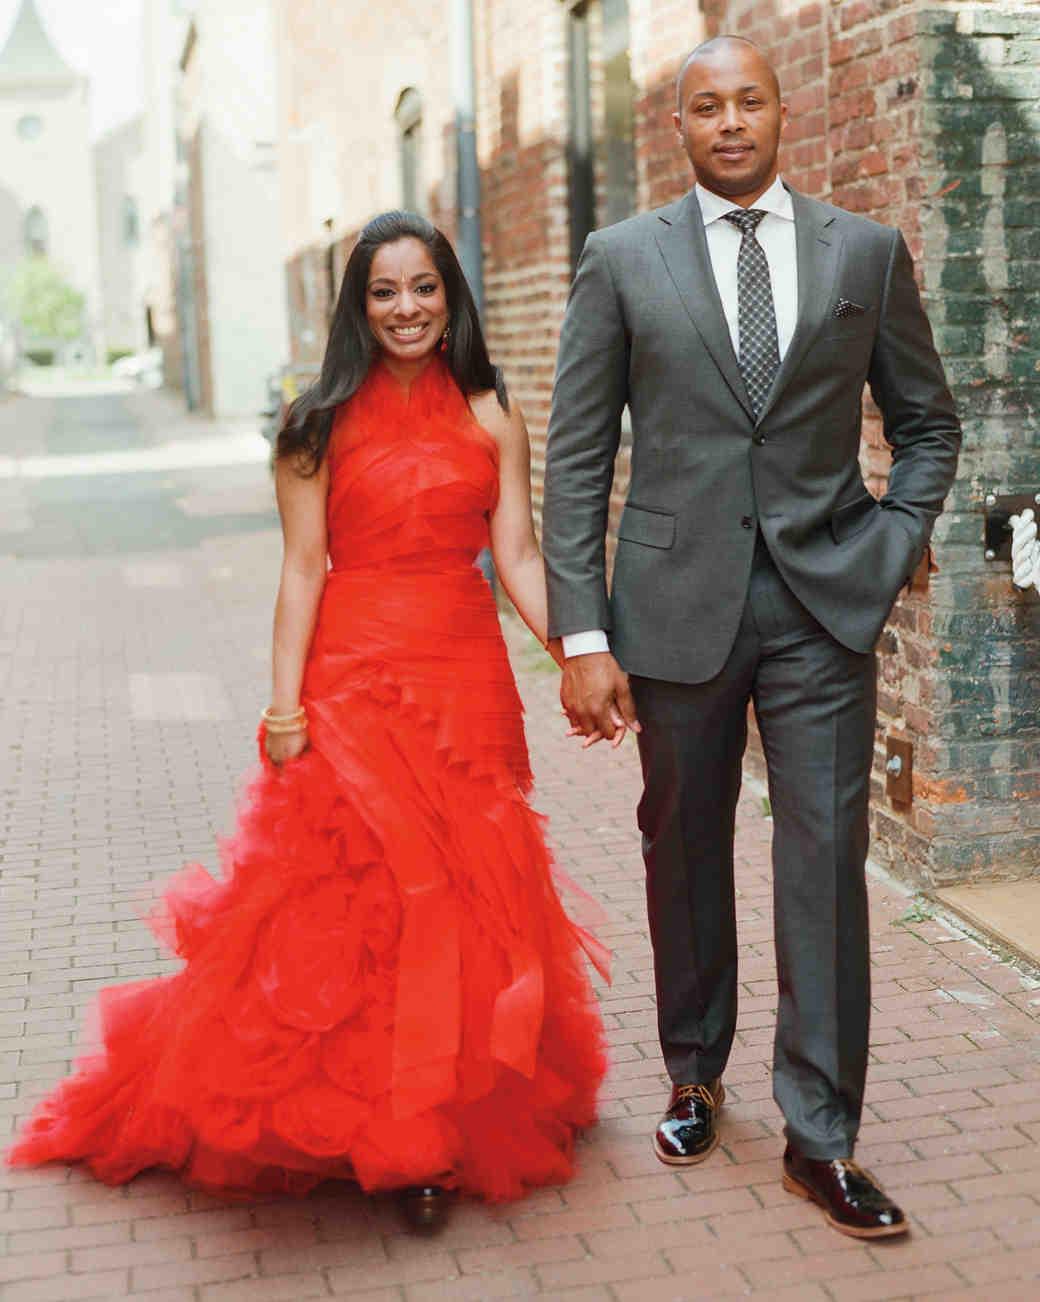 red wedding dresses red wedding dress 1 of 7